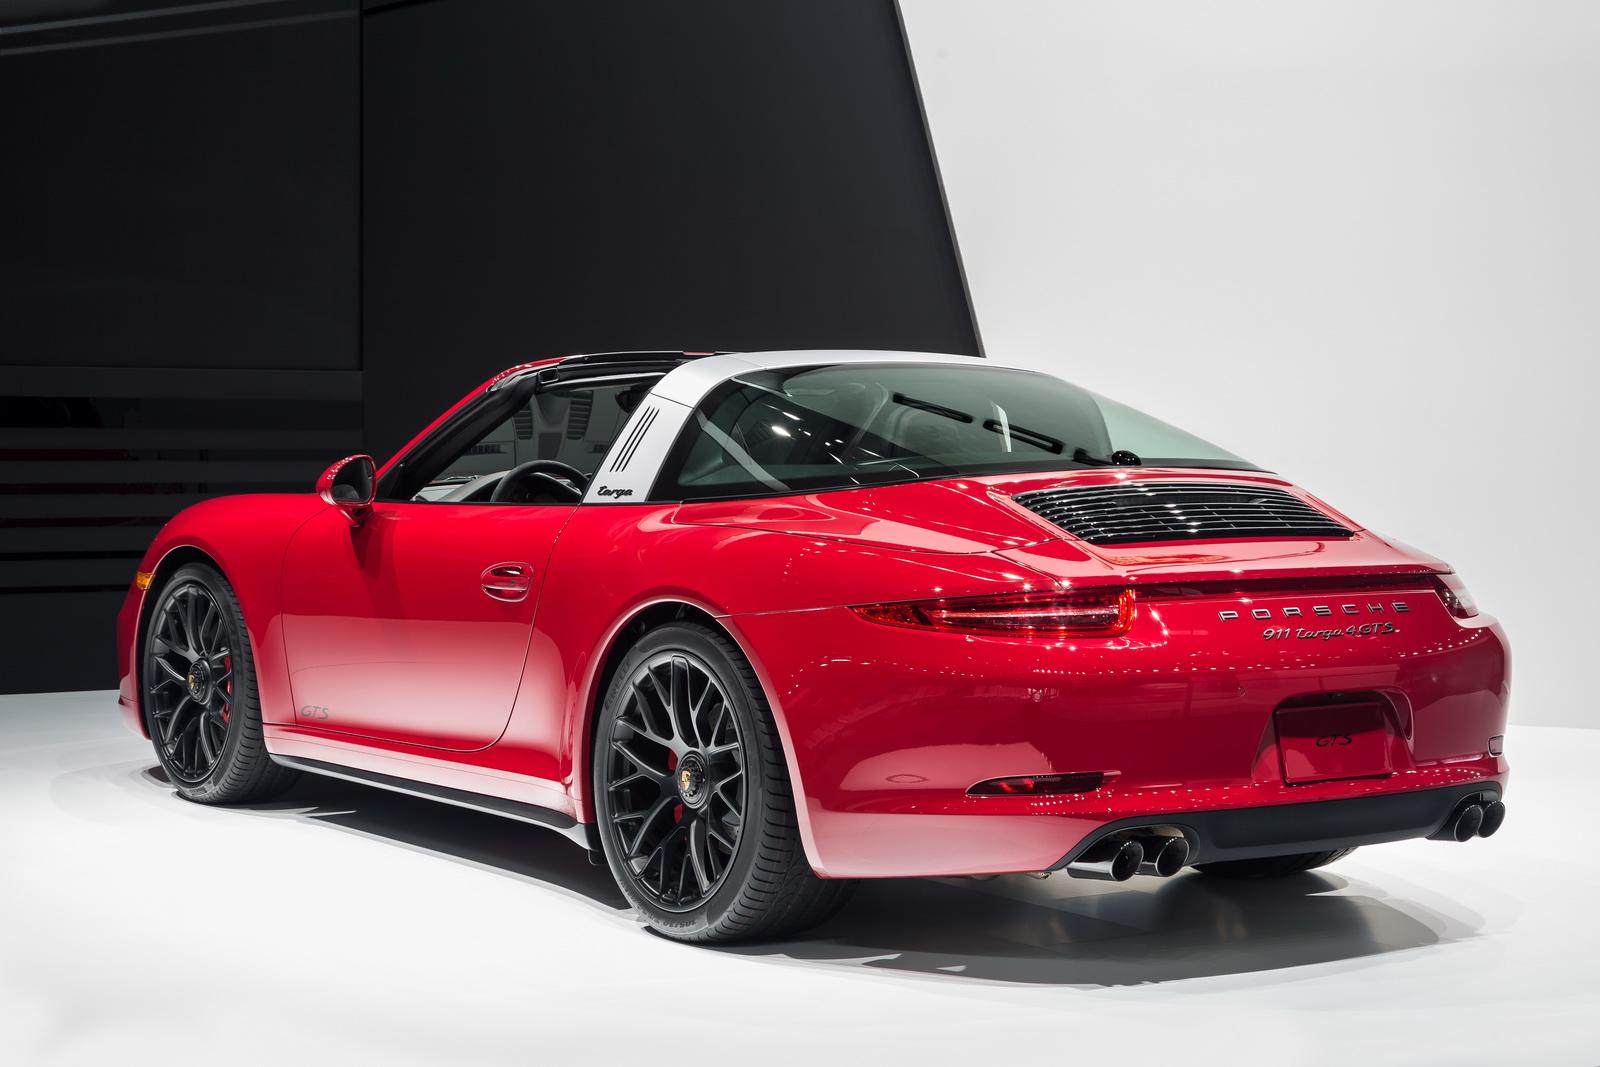 porsche 911 targa 4 gts world premiere at 2015 naias. Black Bedroom Furniture Sets. Home Design Ideas